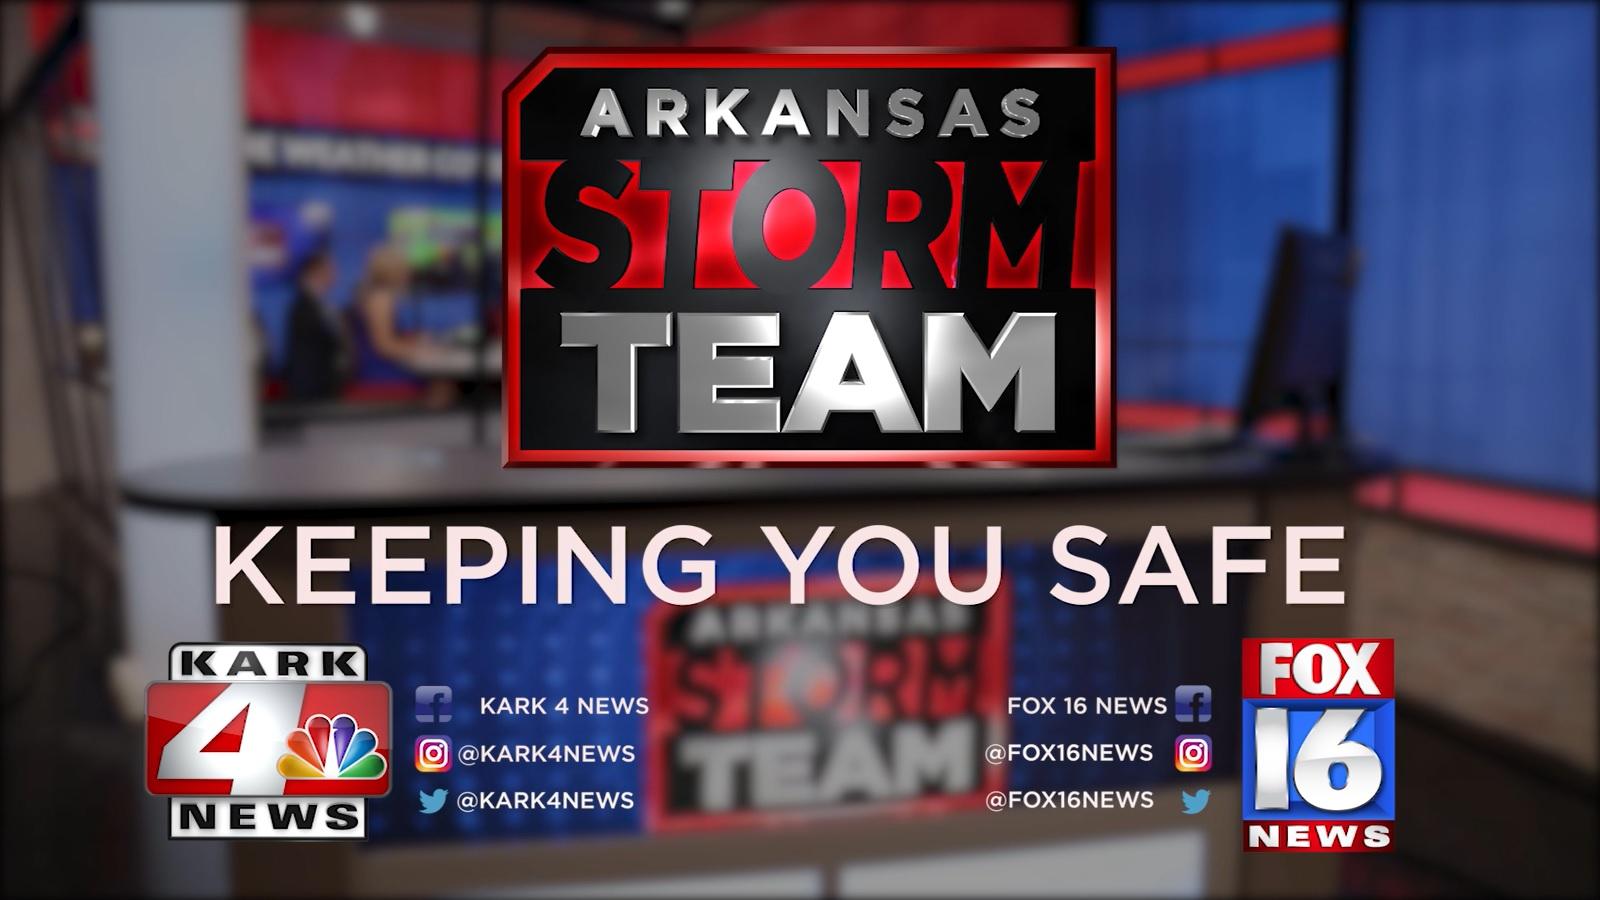 Arkansas Storm Team Weather Radio Awareness Campaign 2019